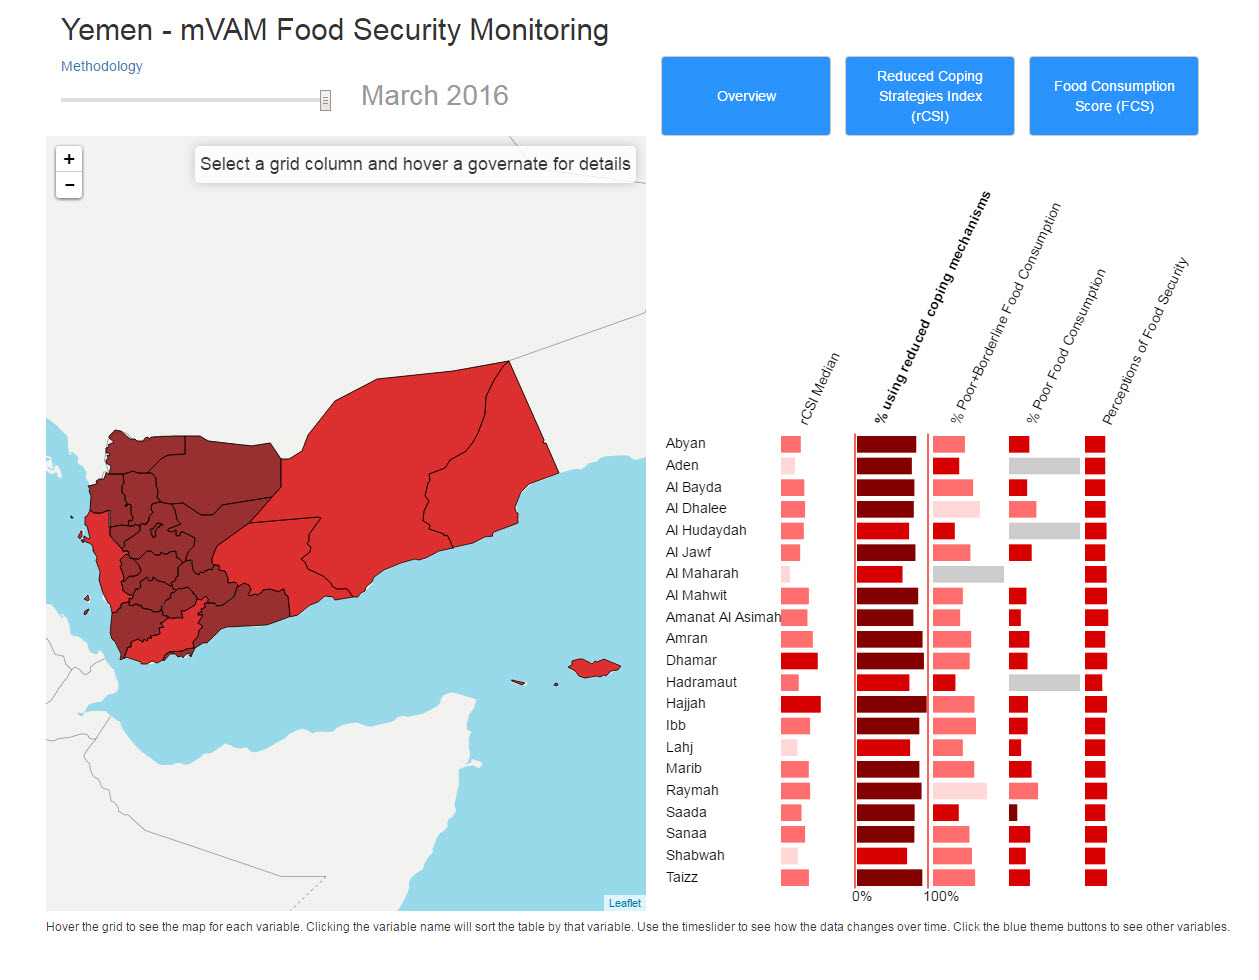 yemen-mvam-food-security-monitoring